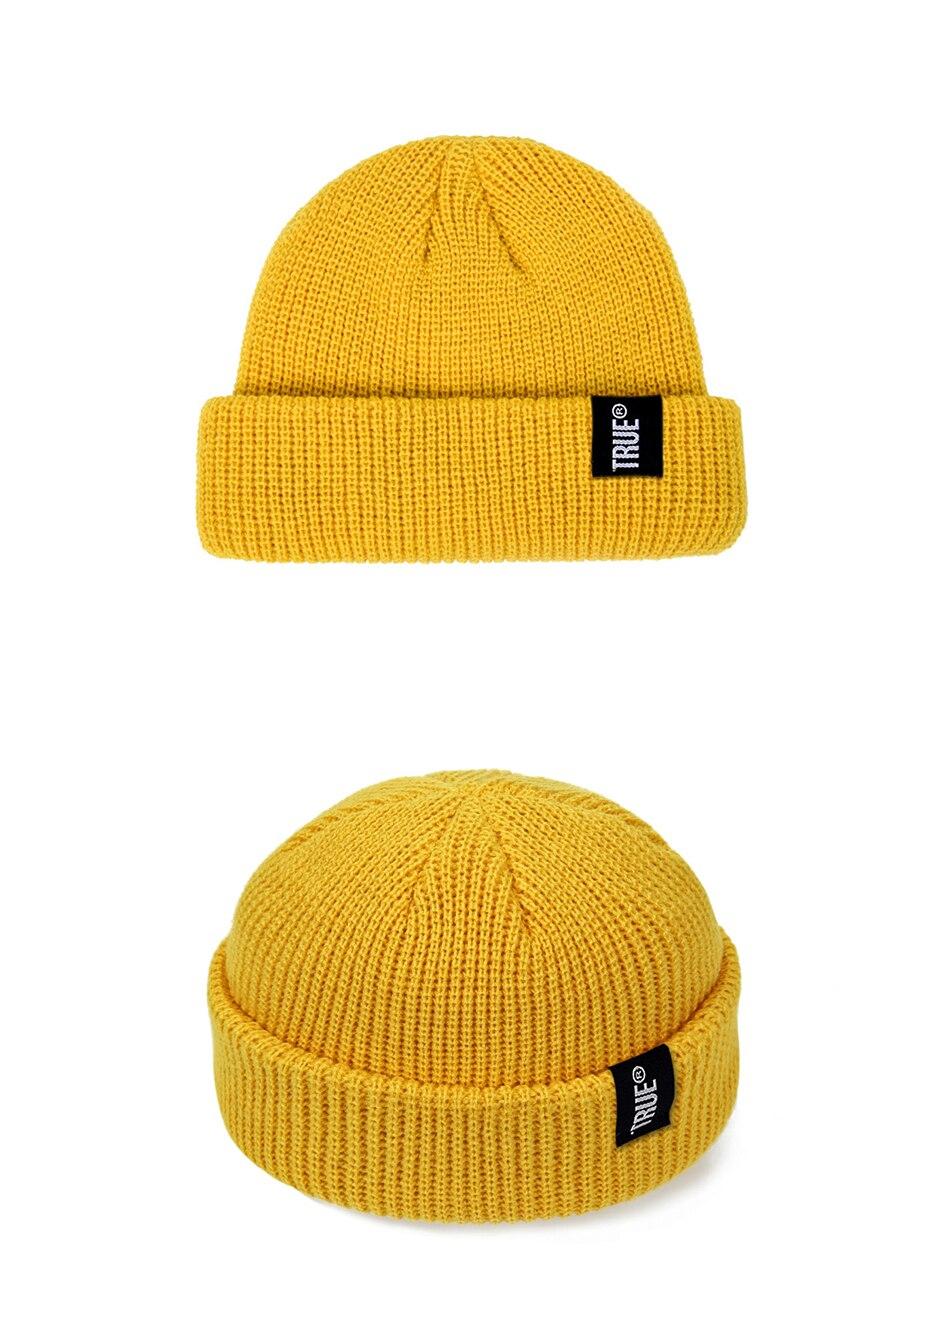 2019 Fashion Unisex Winter Hat Men Cuffed Cib Knit Hat Short Melon Ski Beanies Autumn Winter Solid Color Casual Beanie Hat 26